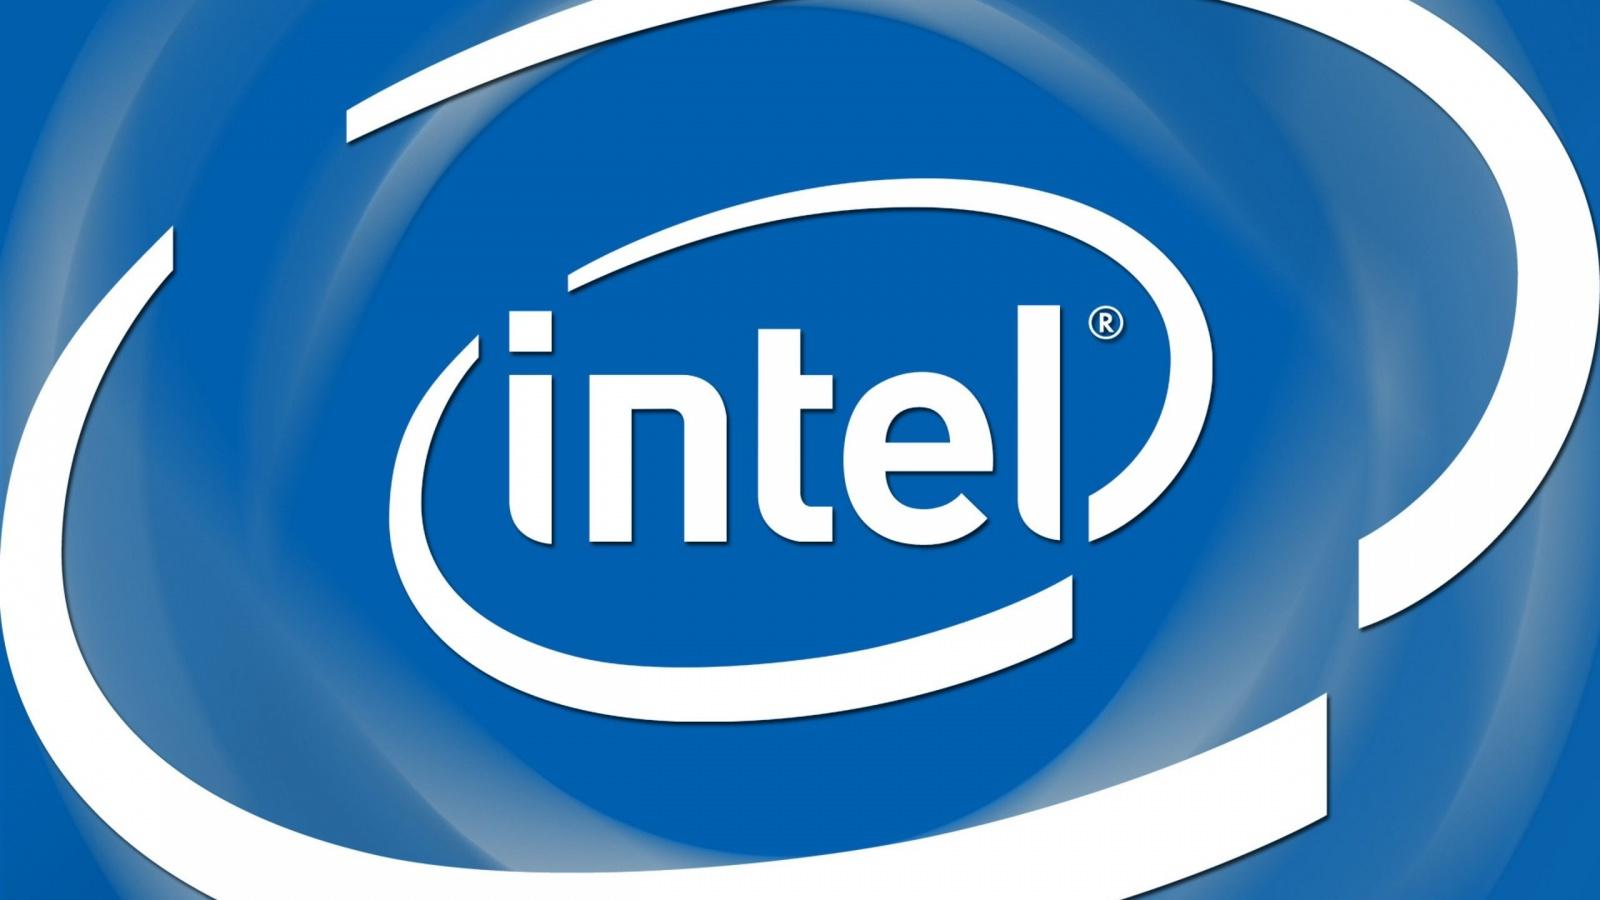 Intel продаёт IIoT-компанию Wind River фирме TPG Capital